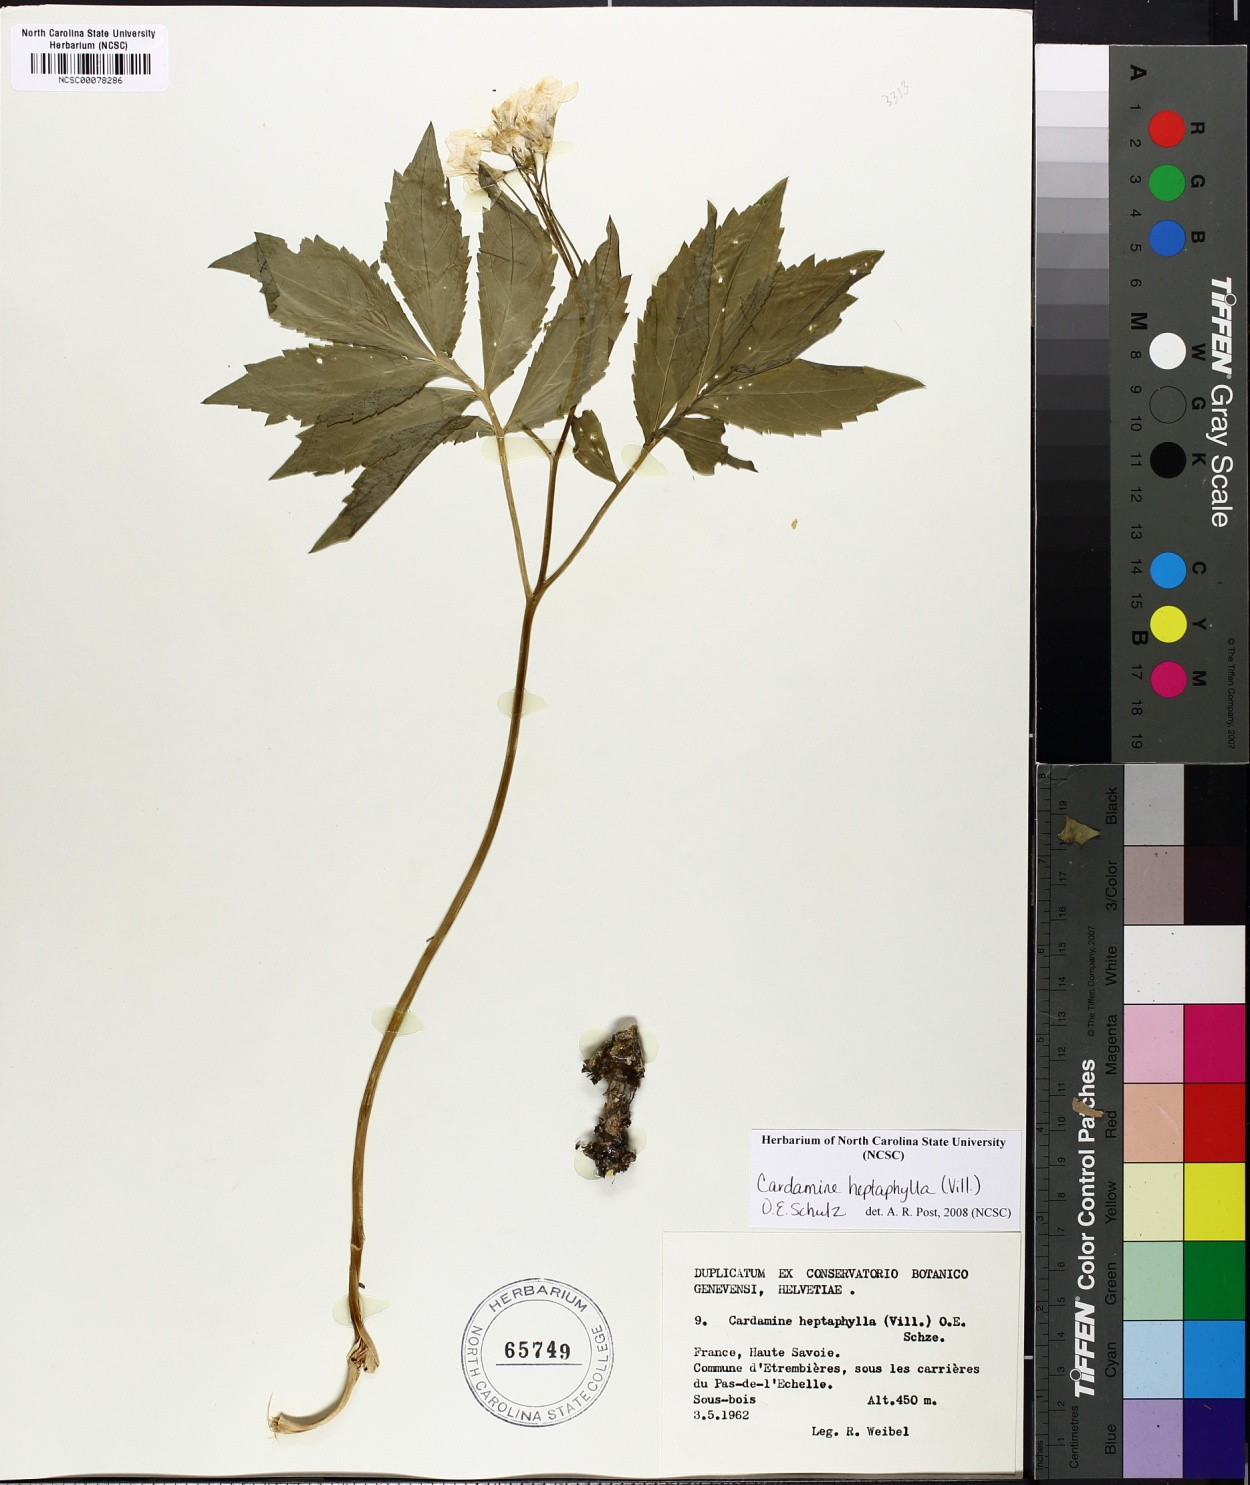 Cardamine heptaphylla image